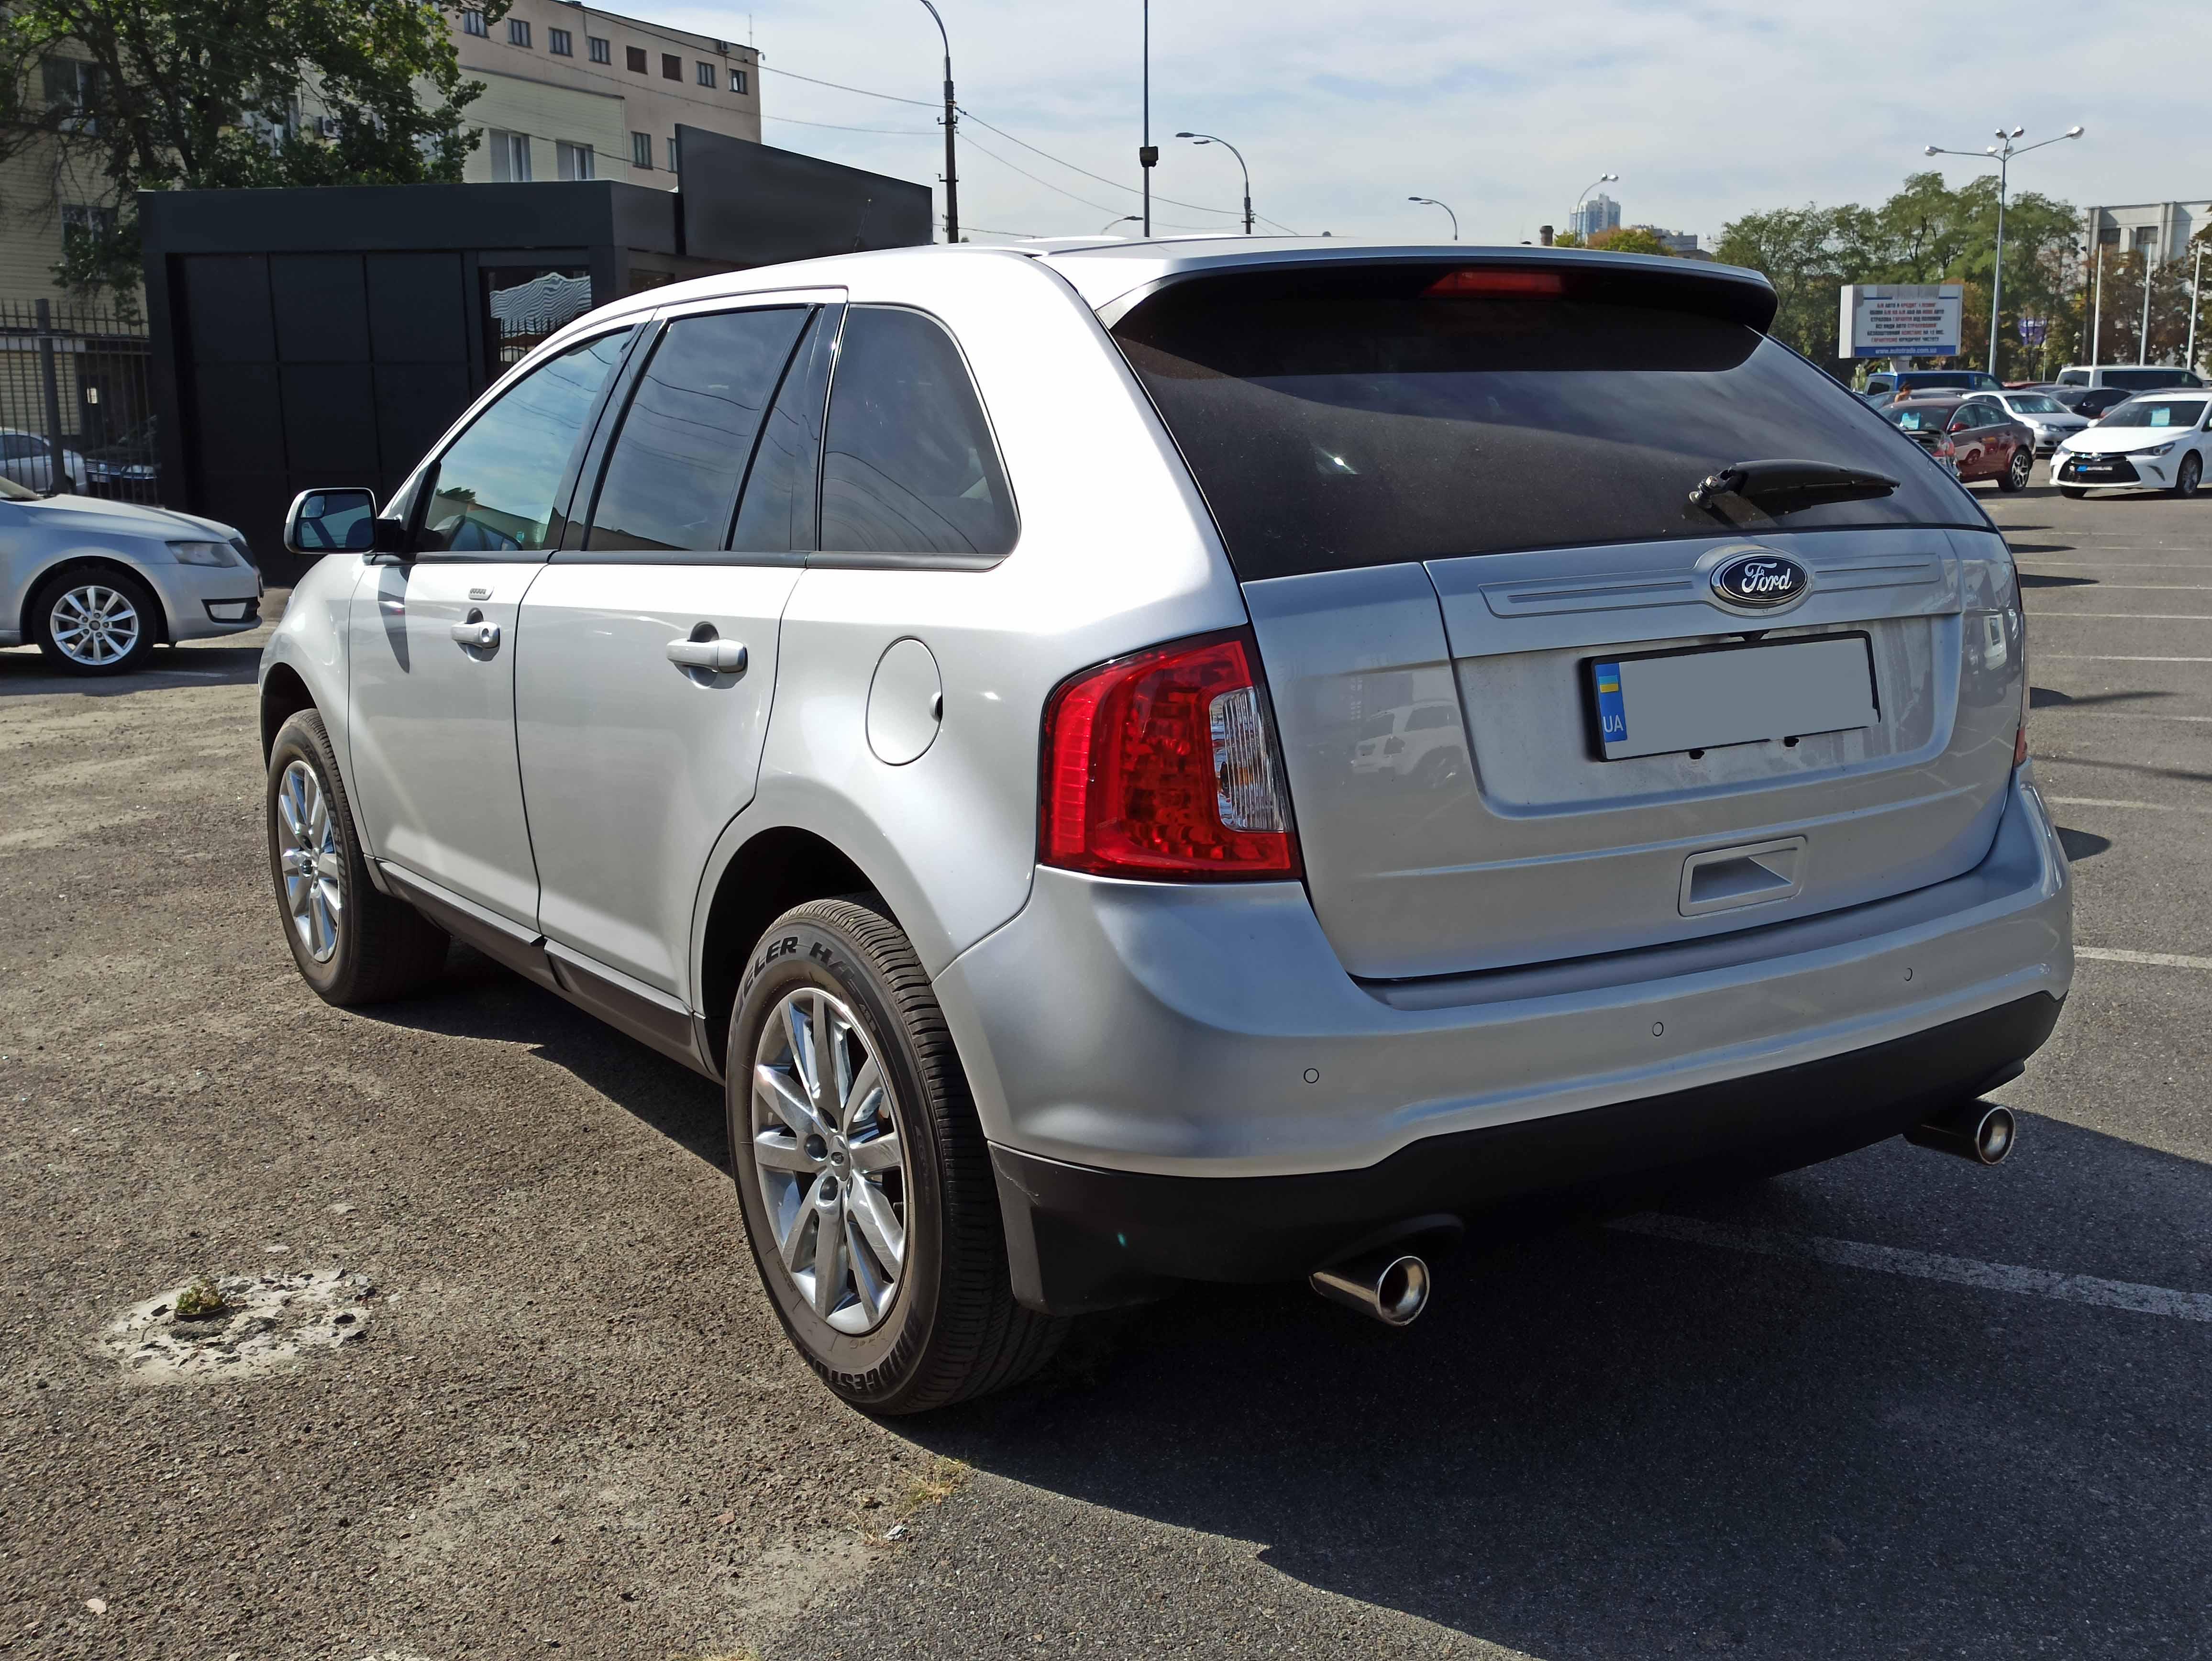 2014 Ford EDGE | Vin: 2FMDK3JC5EBB38611